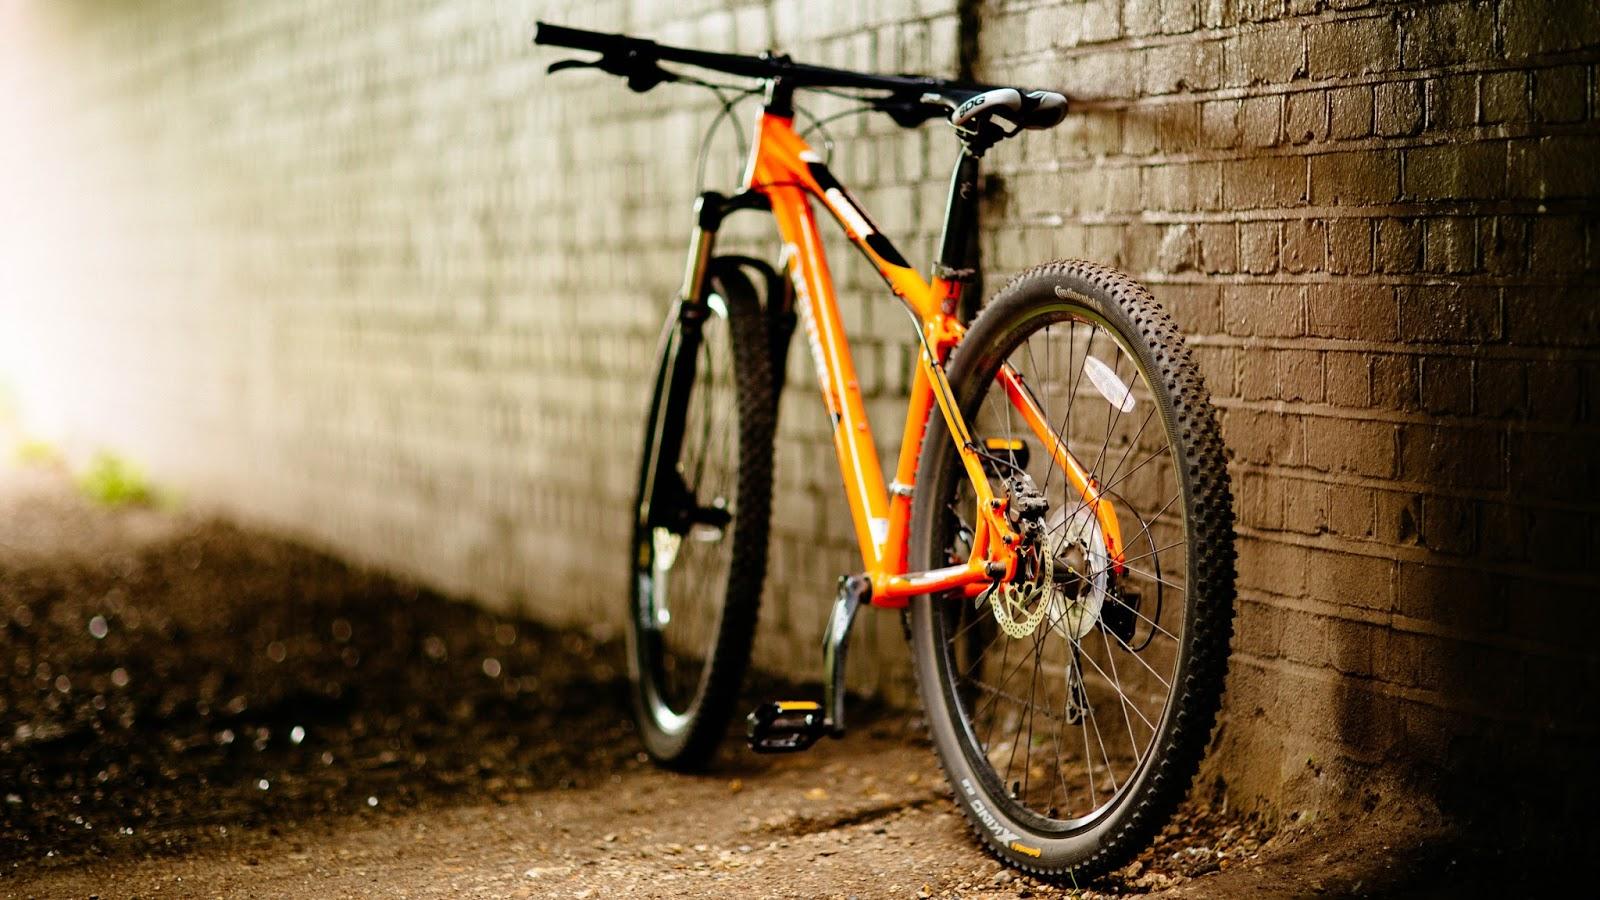 Hd Wonderful Background 10 Unique Bicycle Hd Wallpapers For Wonderful Background